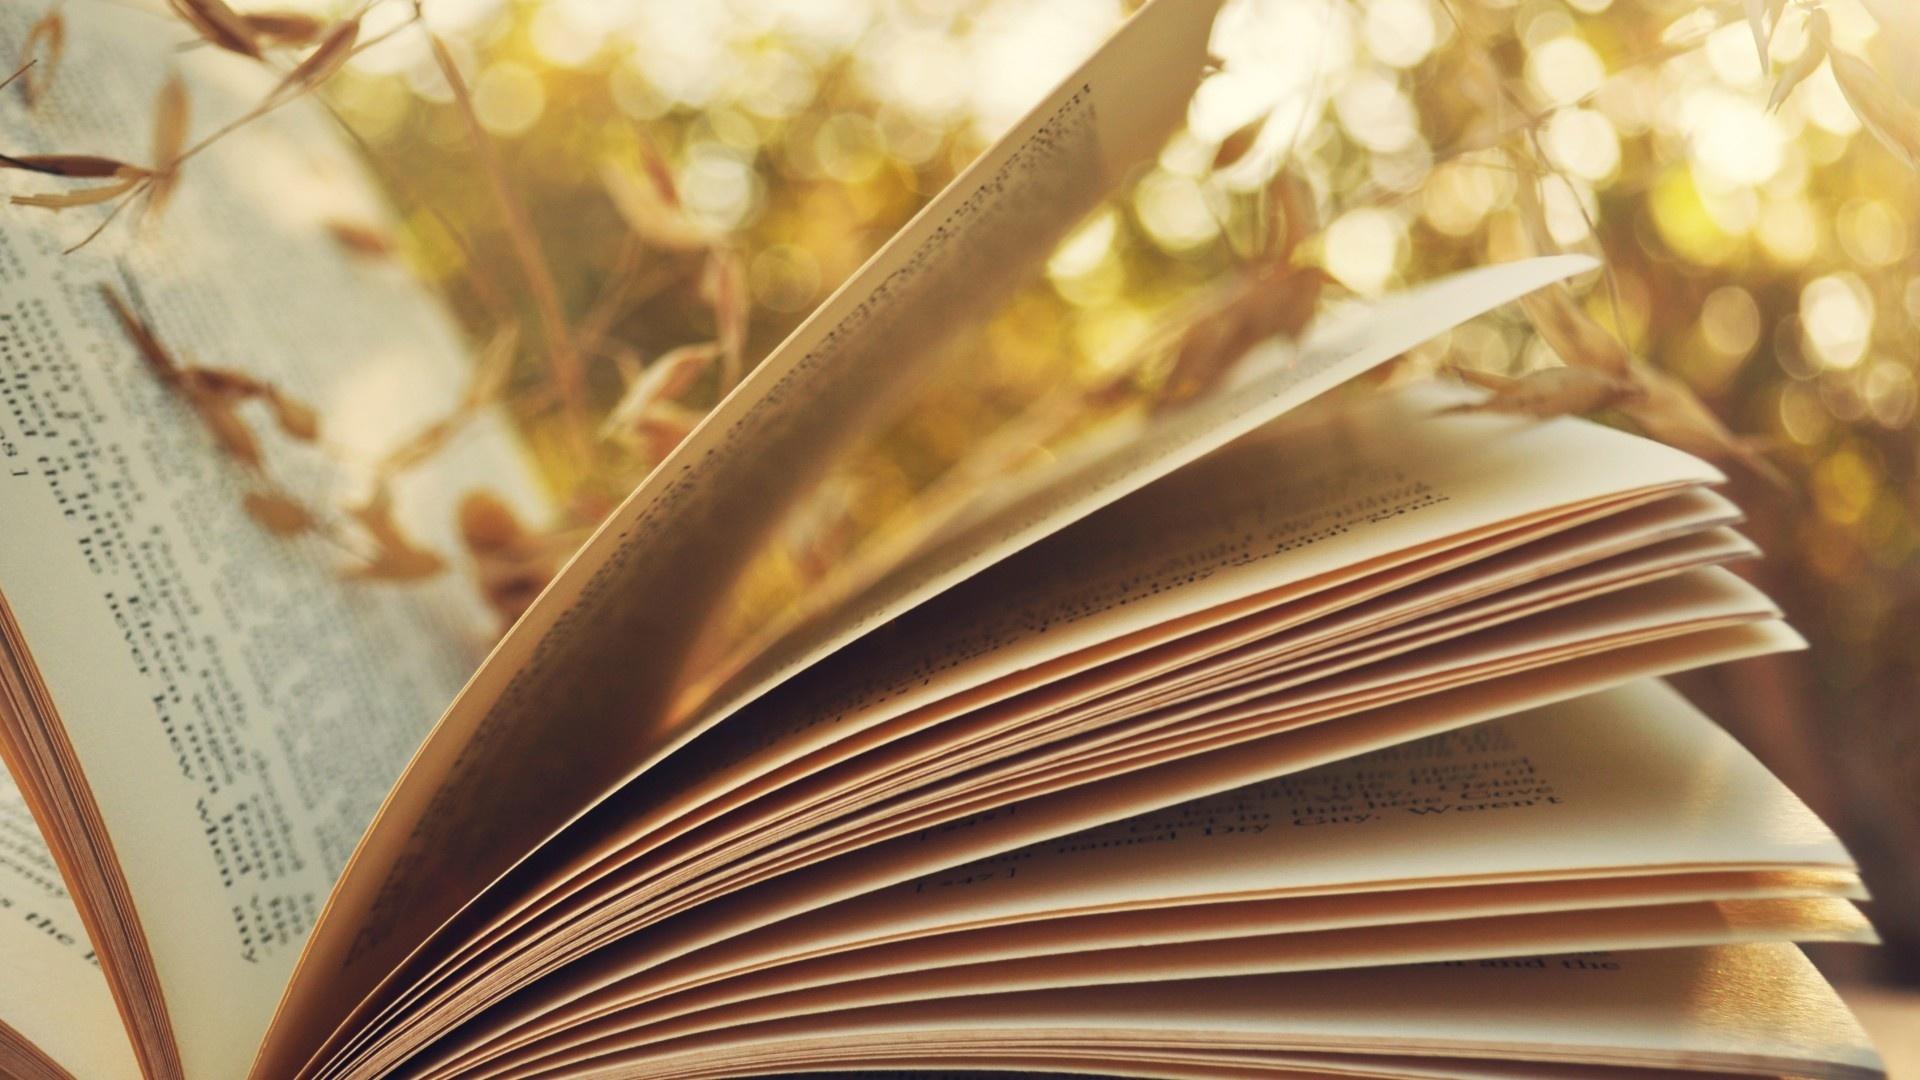 Literary Image